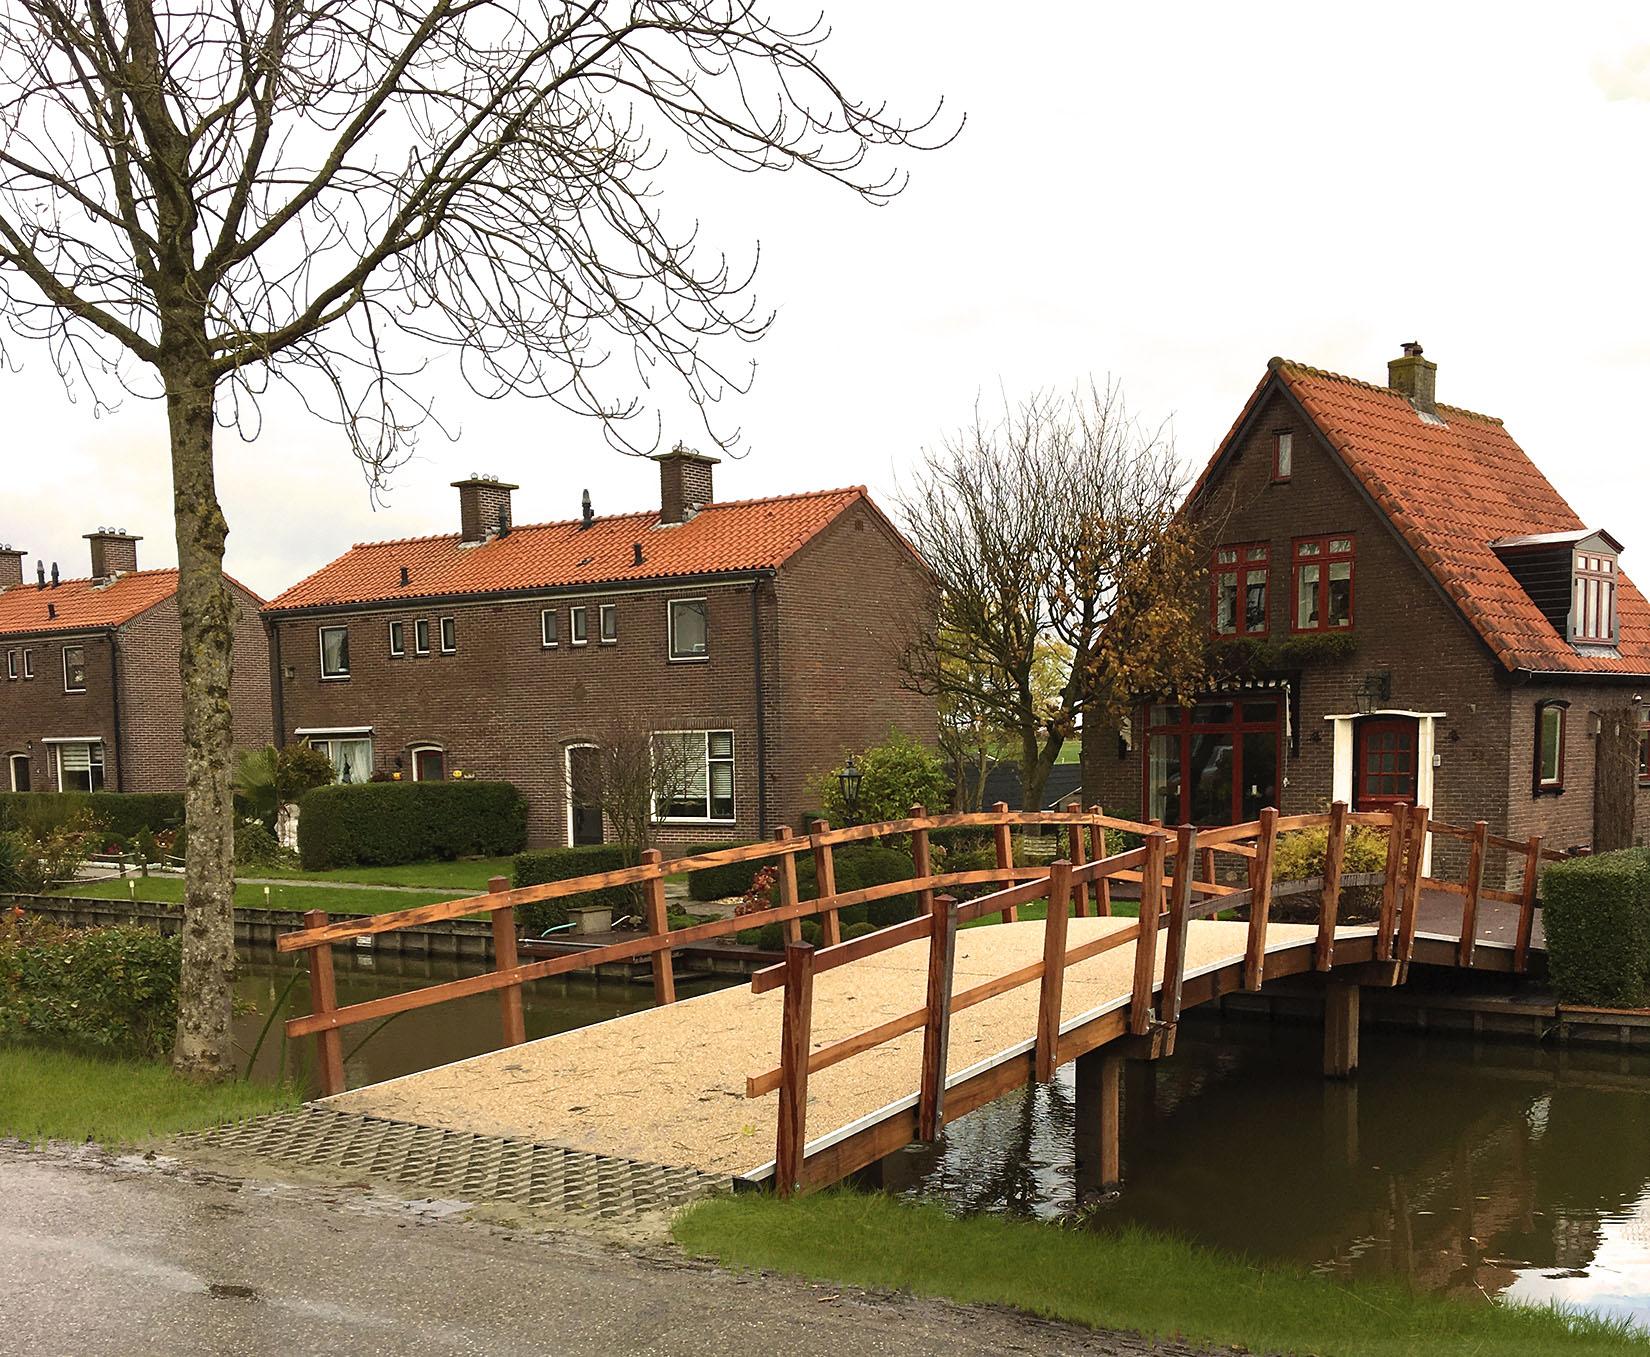 Haasnoot_Bruggen_Houten_toegangsbrug_particuliere_woning